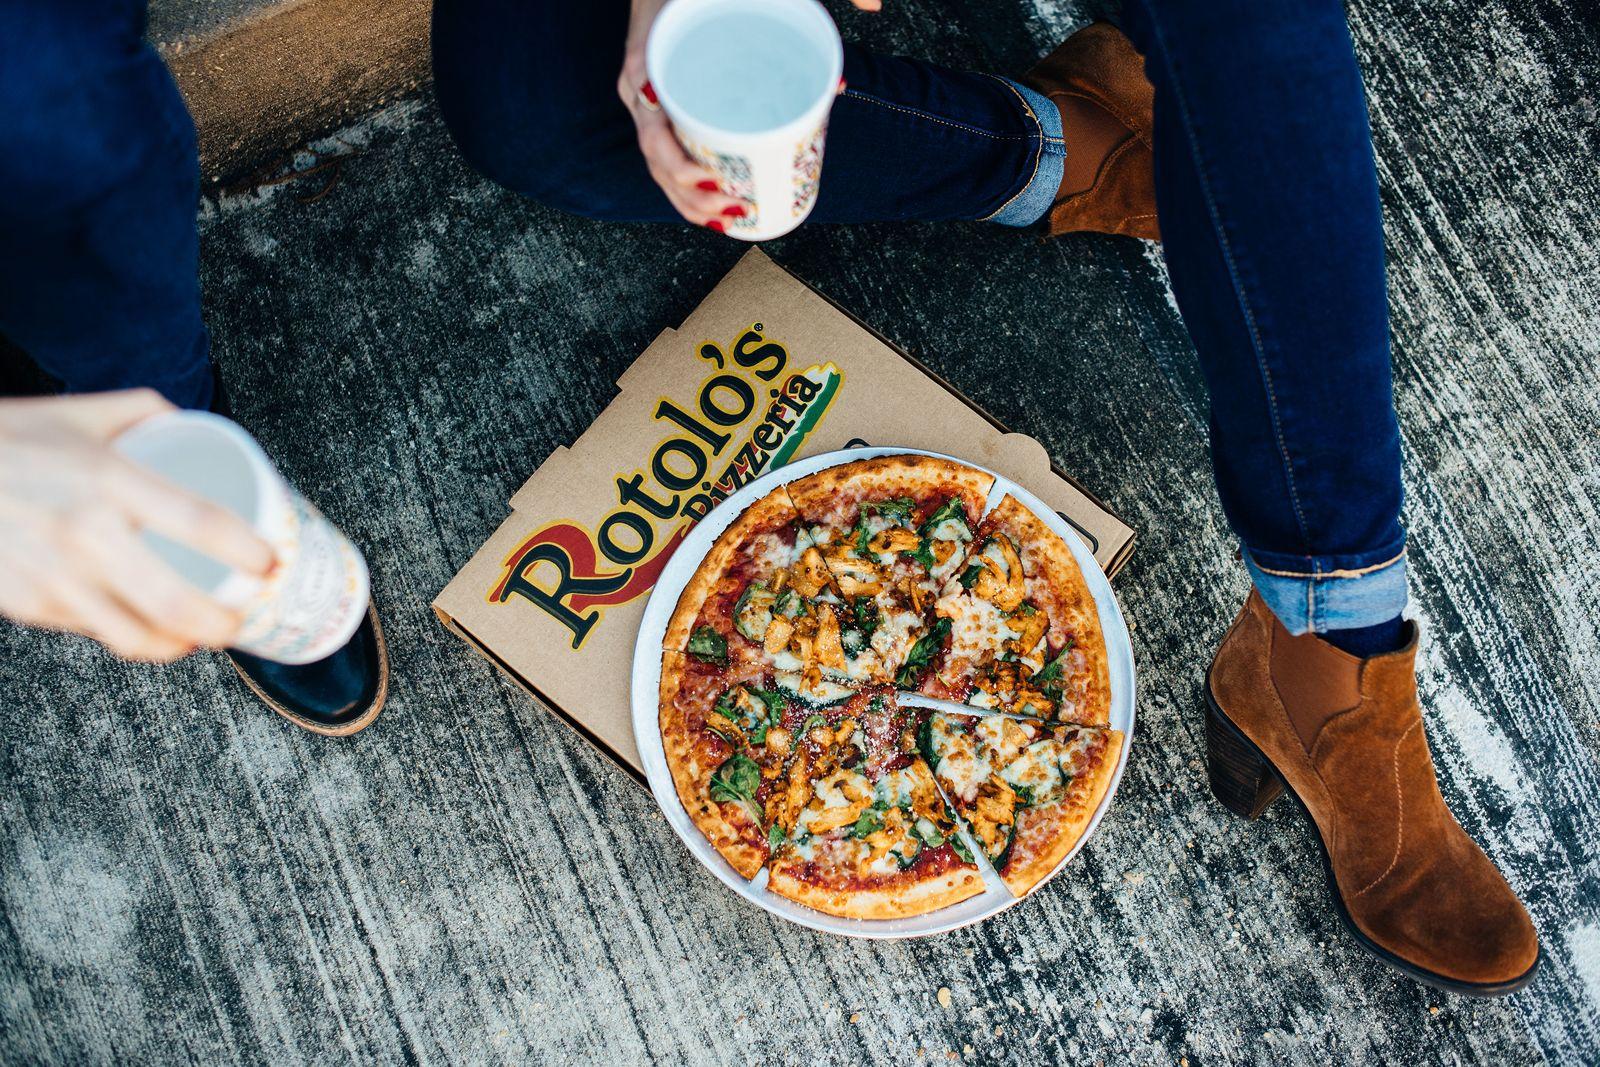 Rotolo's Debuts Fresh Flavors for Spring Menu